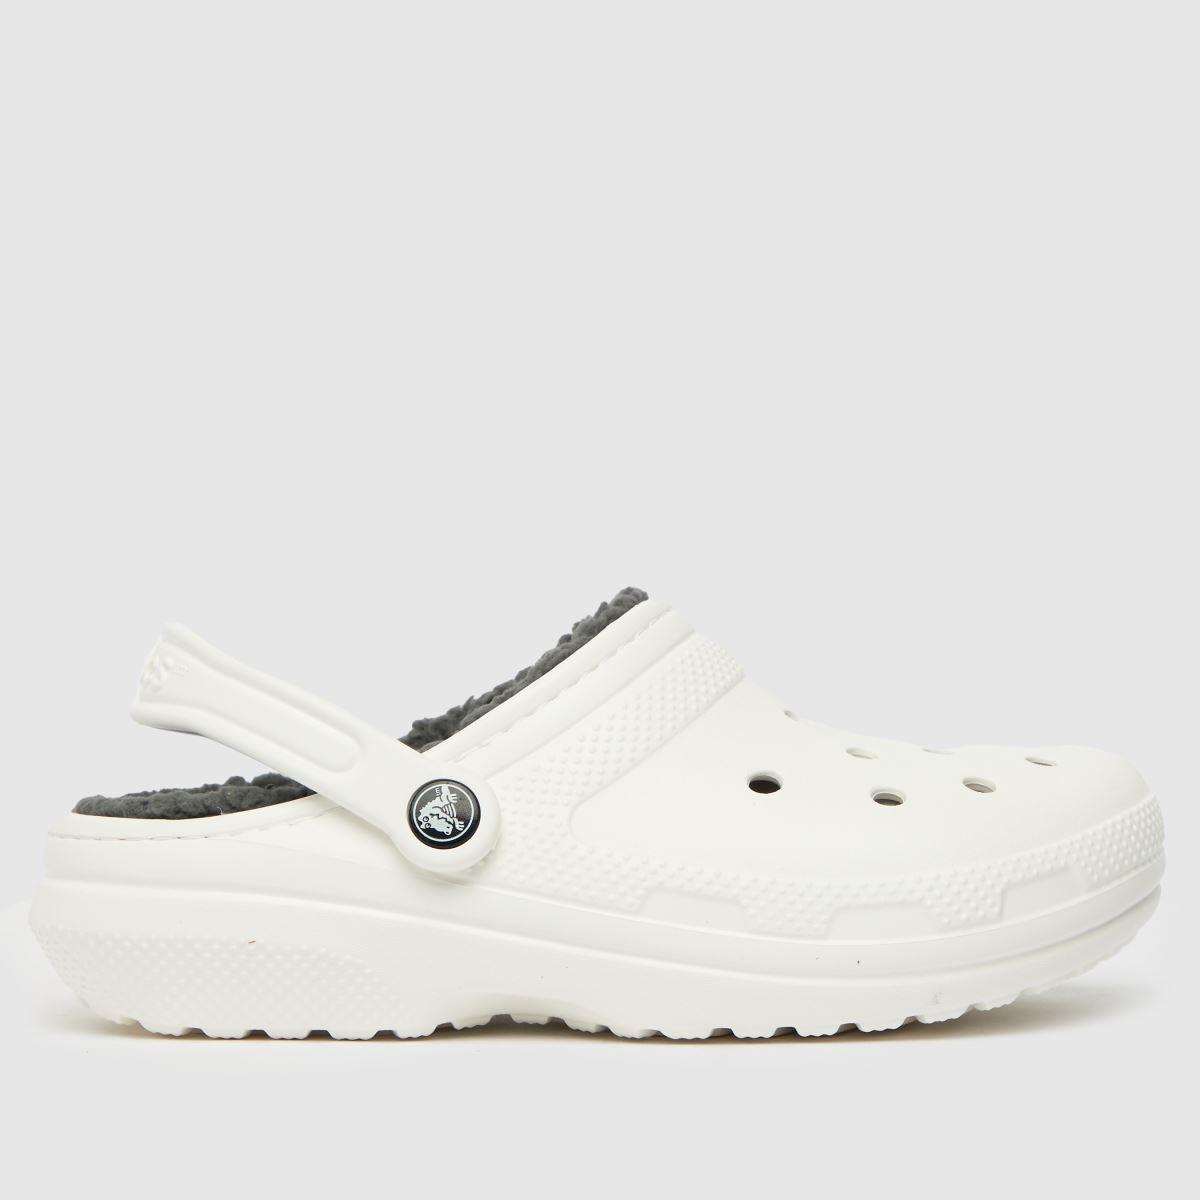 Crocs White Warm Lined Clogs Sandals